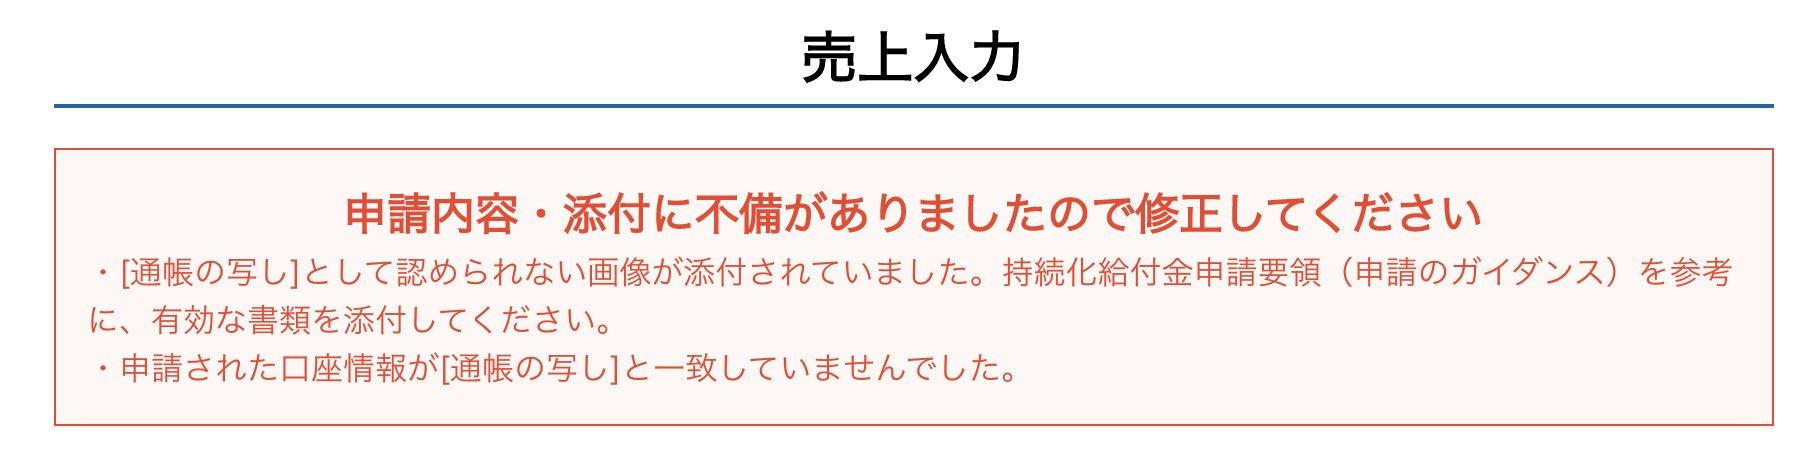 銀行 コピー 楽天 通帳